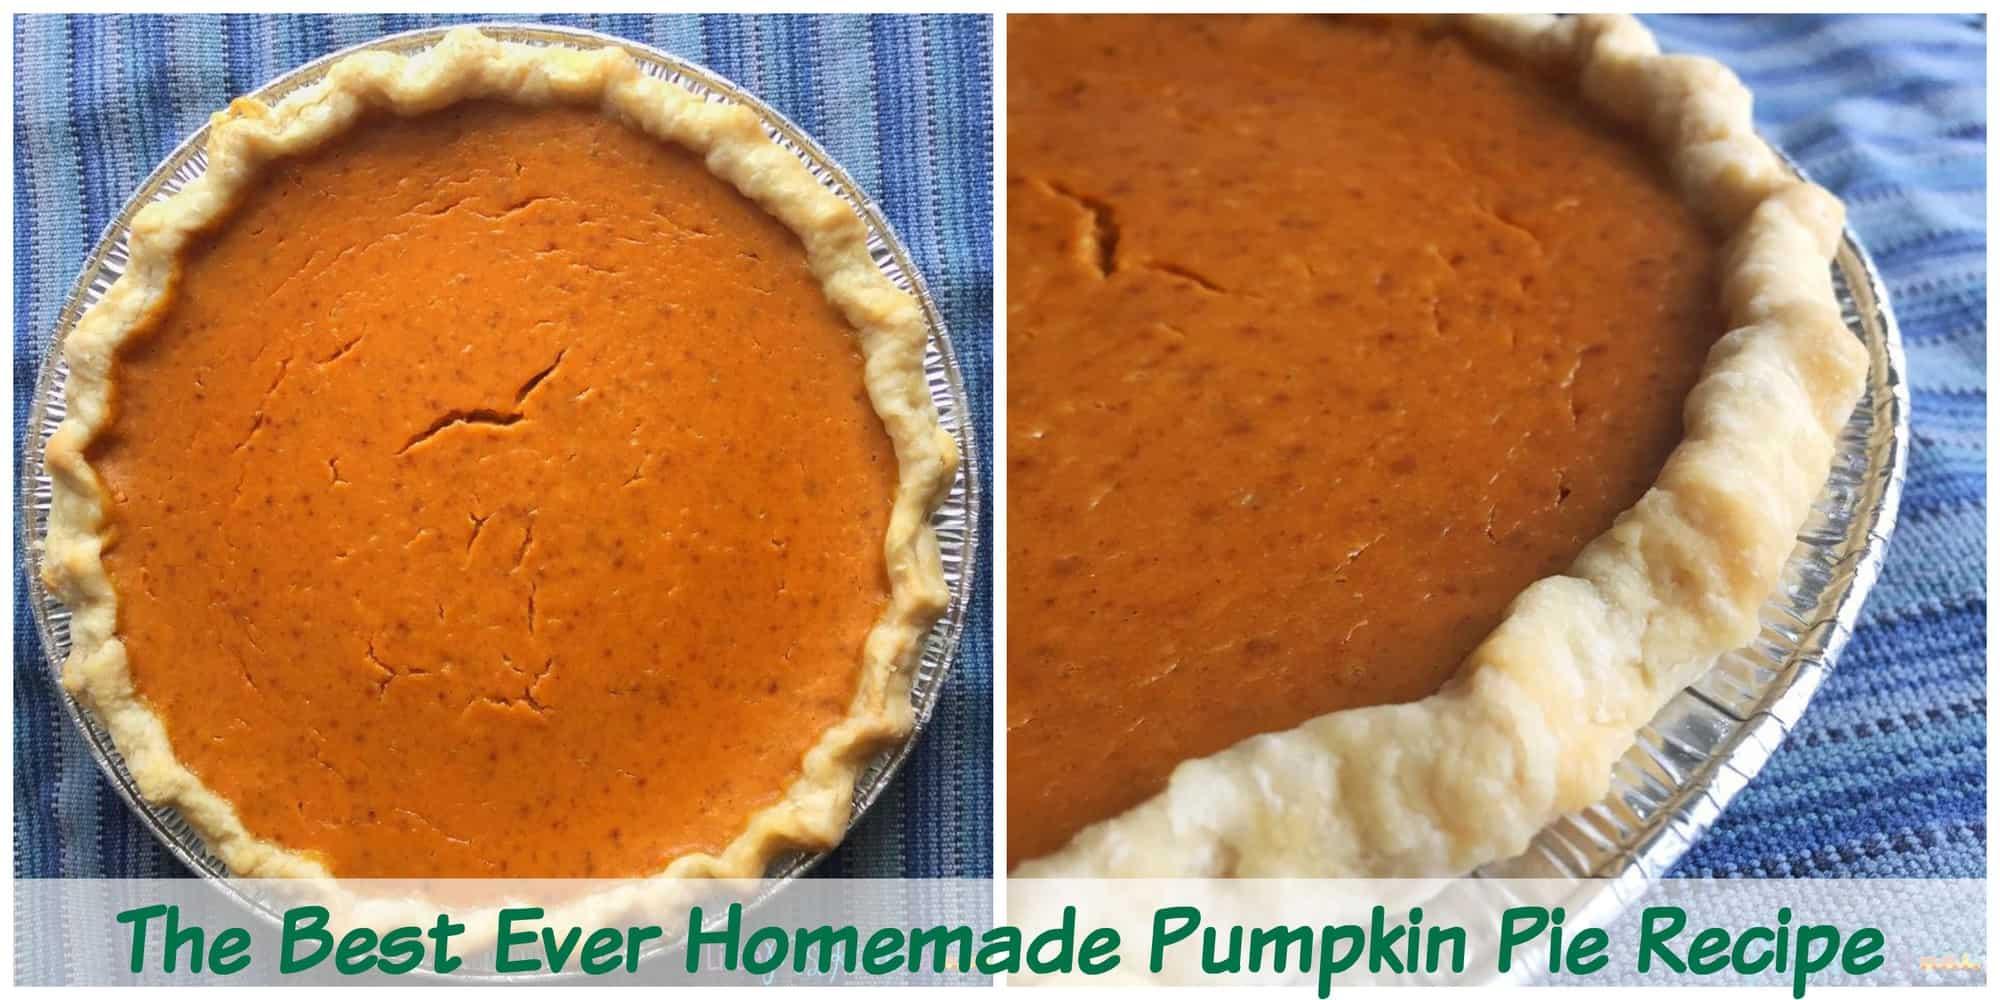 The Best Homemade Pumpkin Pie Recipe with Canned Pumpkin